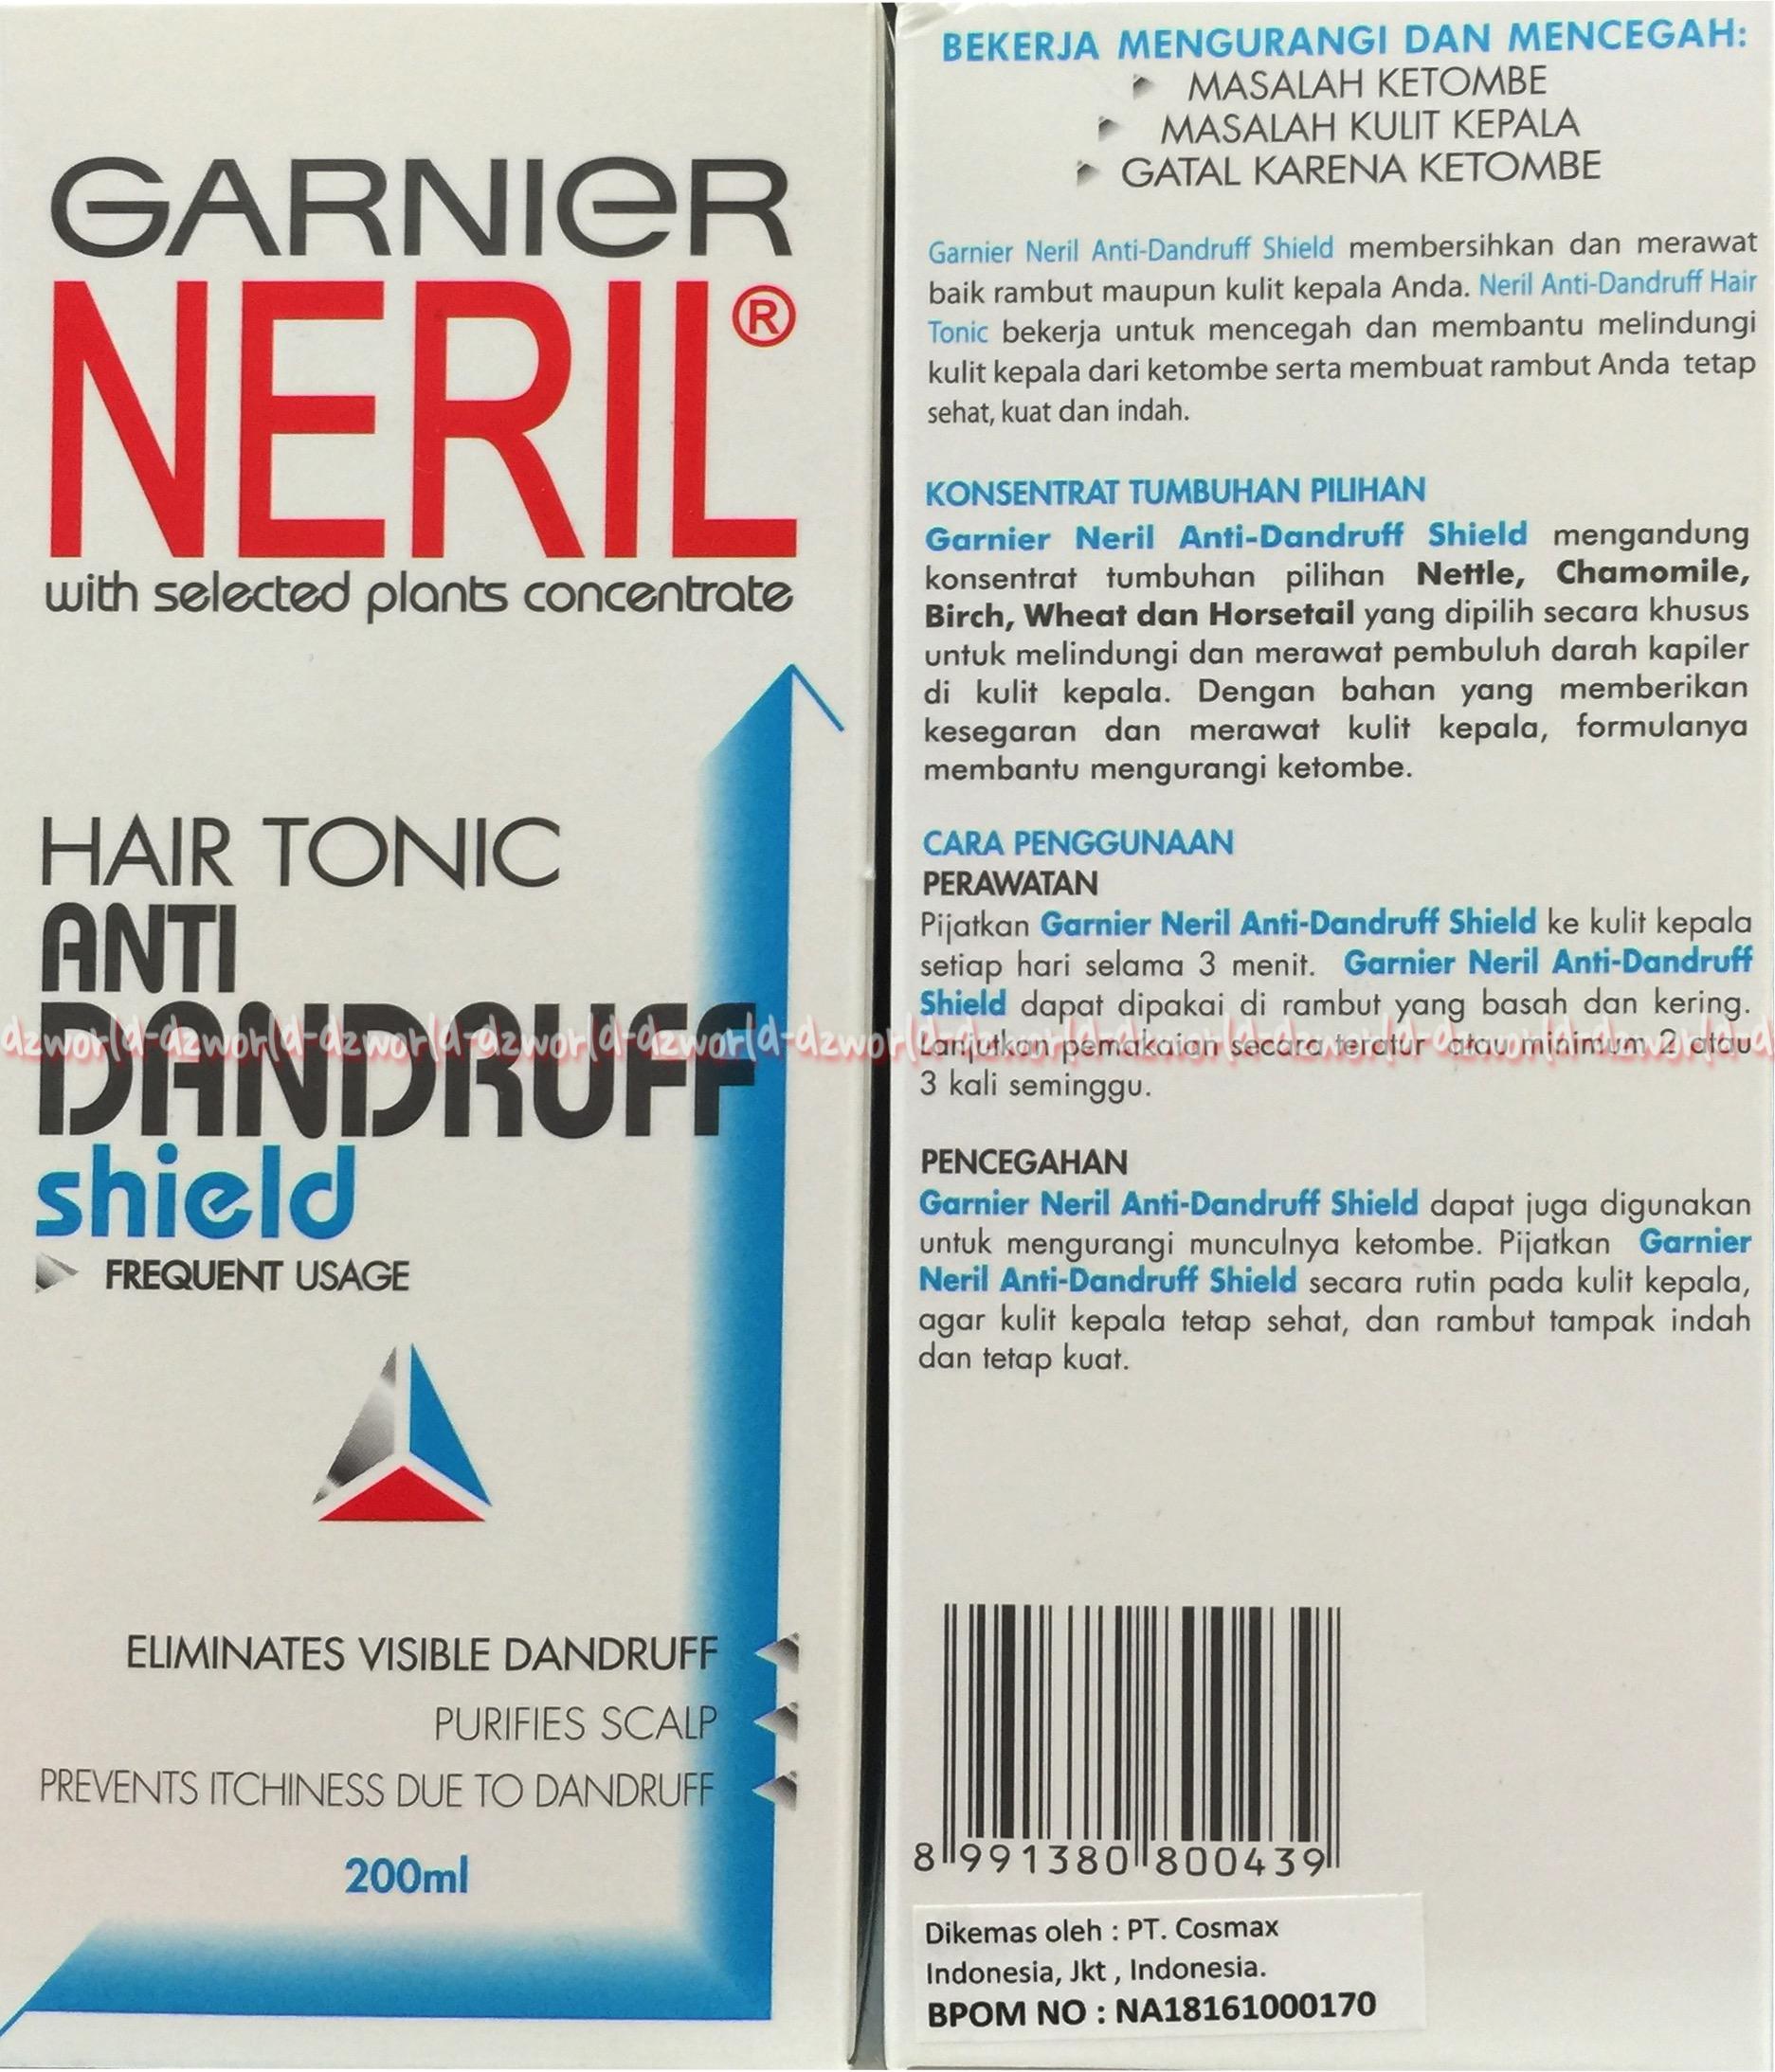 Neril Shampoo Anti Dandruff Shield 200ml Daftar Harga Terbaru Garnier Loss Guard Tonic 200 Ml Jual Hair Ketombe Biru Dz World